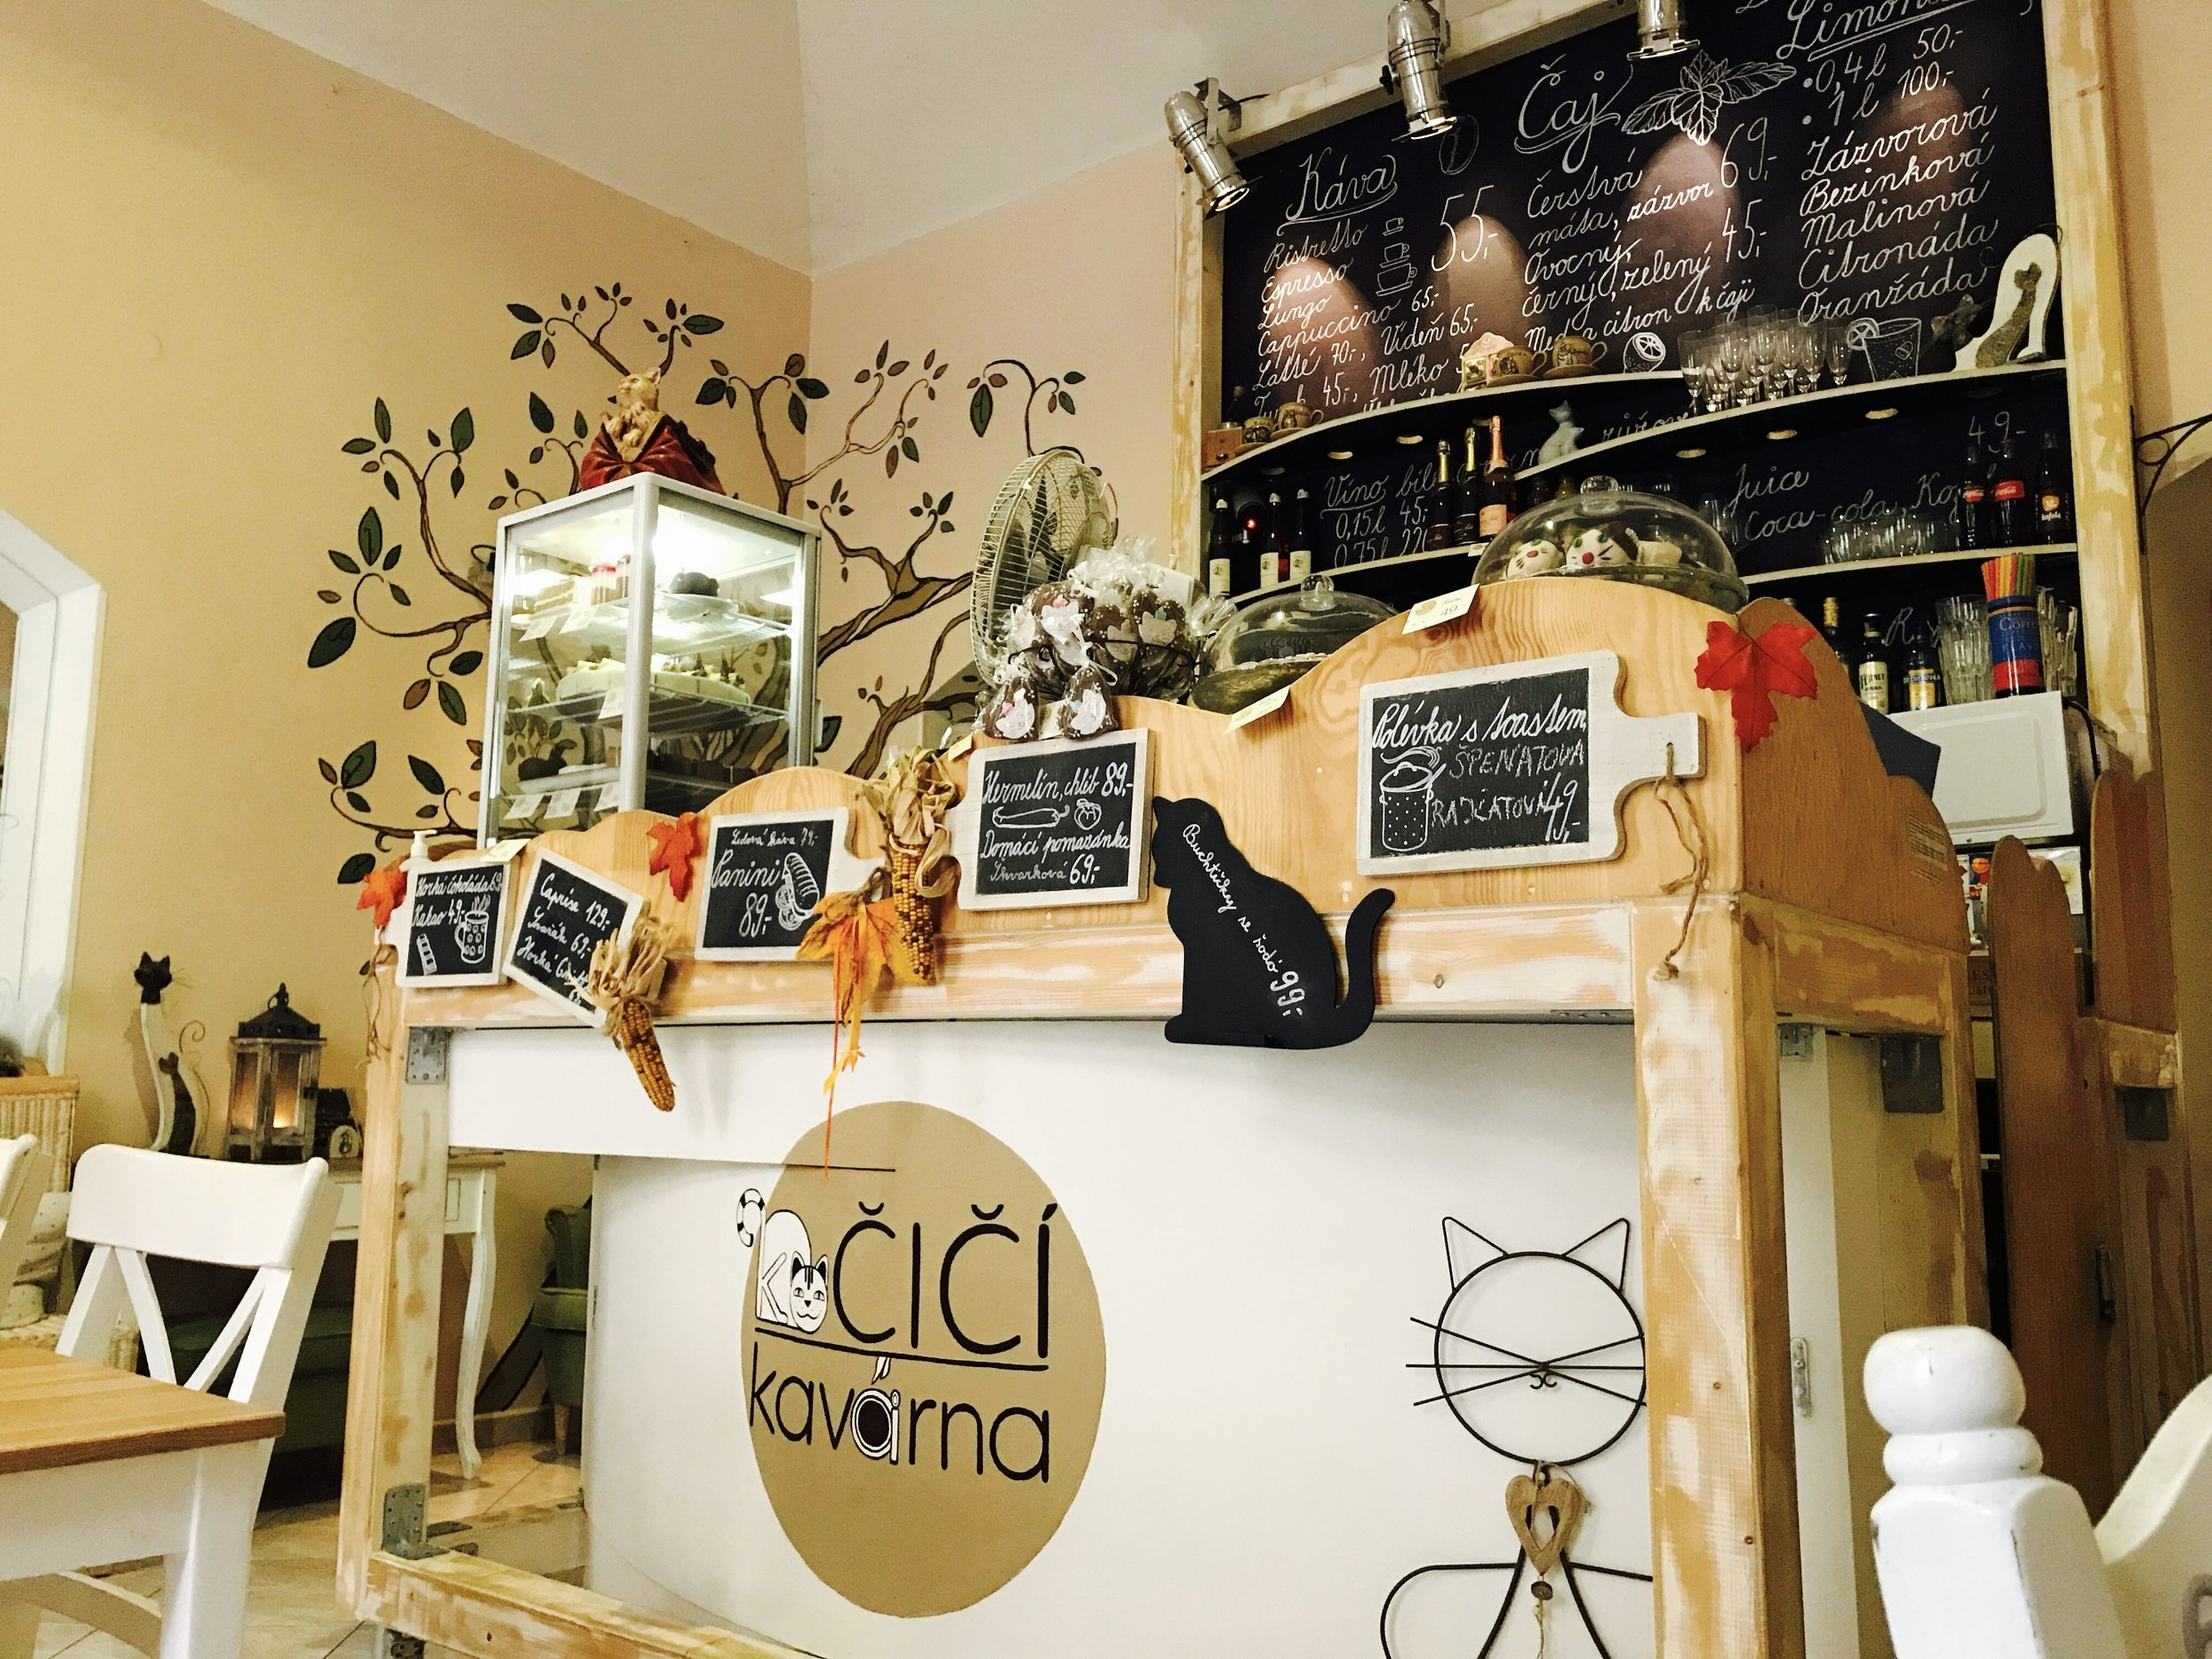 Kocici Kavarna is a beautiful cat cafe in Prague, Czech Republic